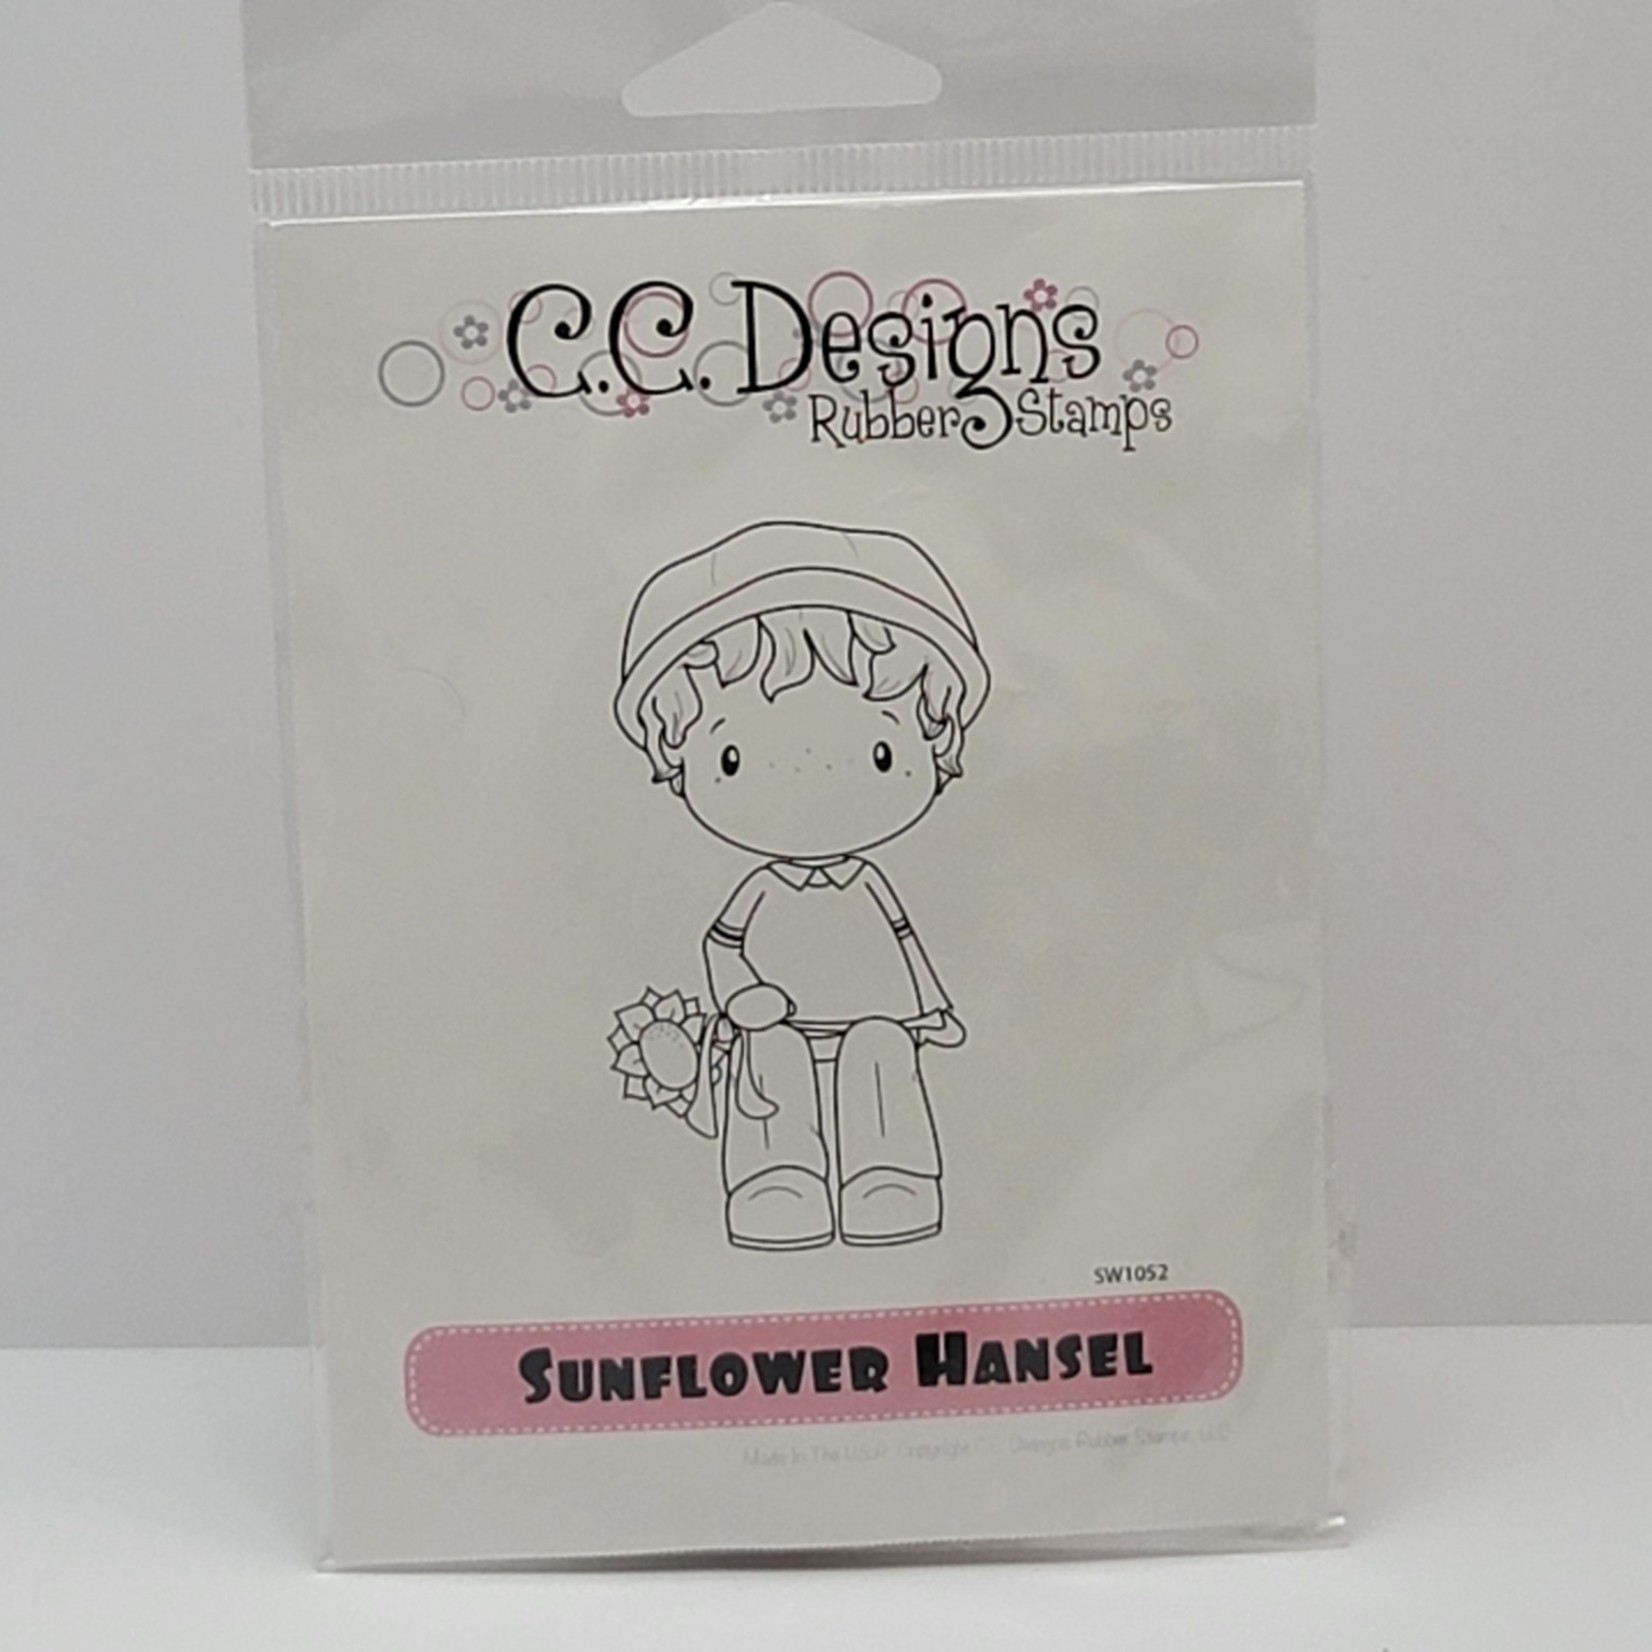 C.C. Designs - Rubber stamp - Sunflower Hansel